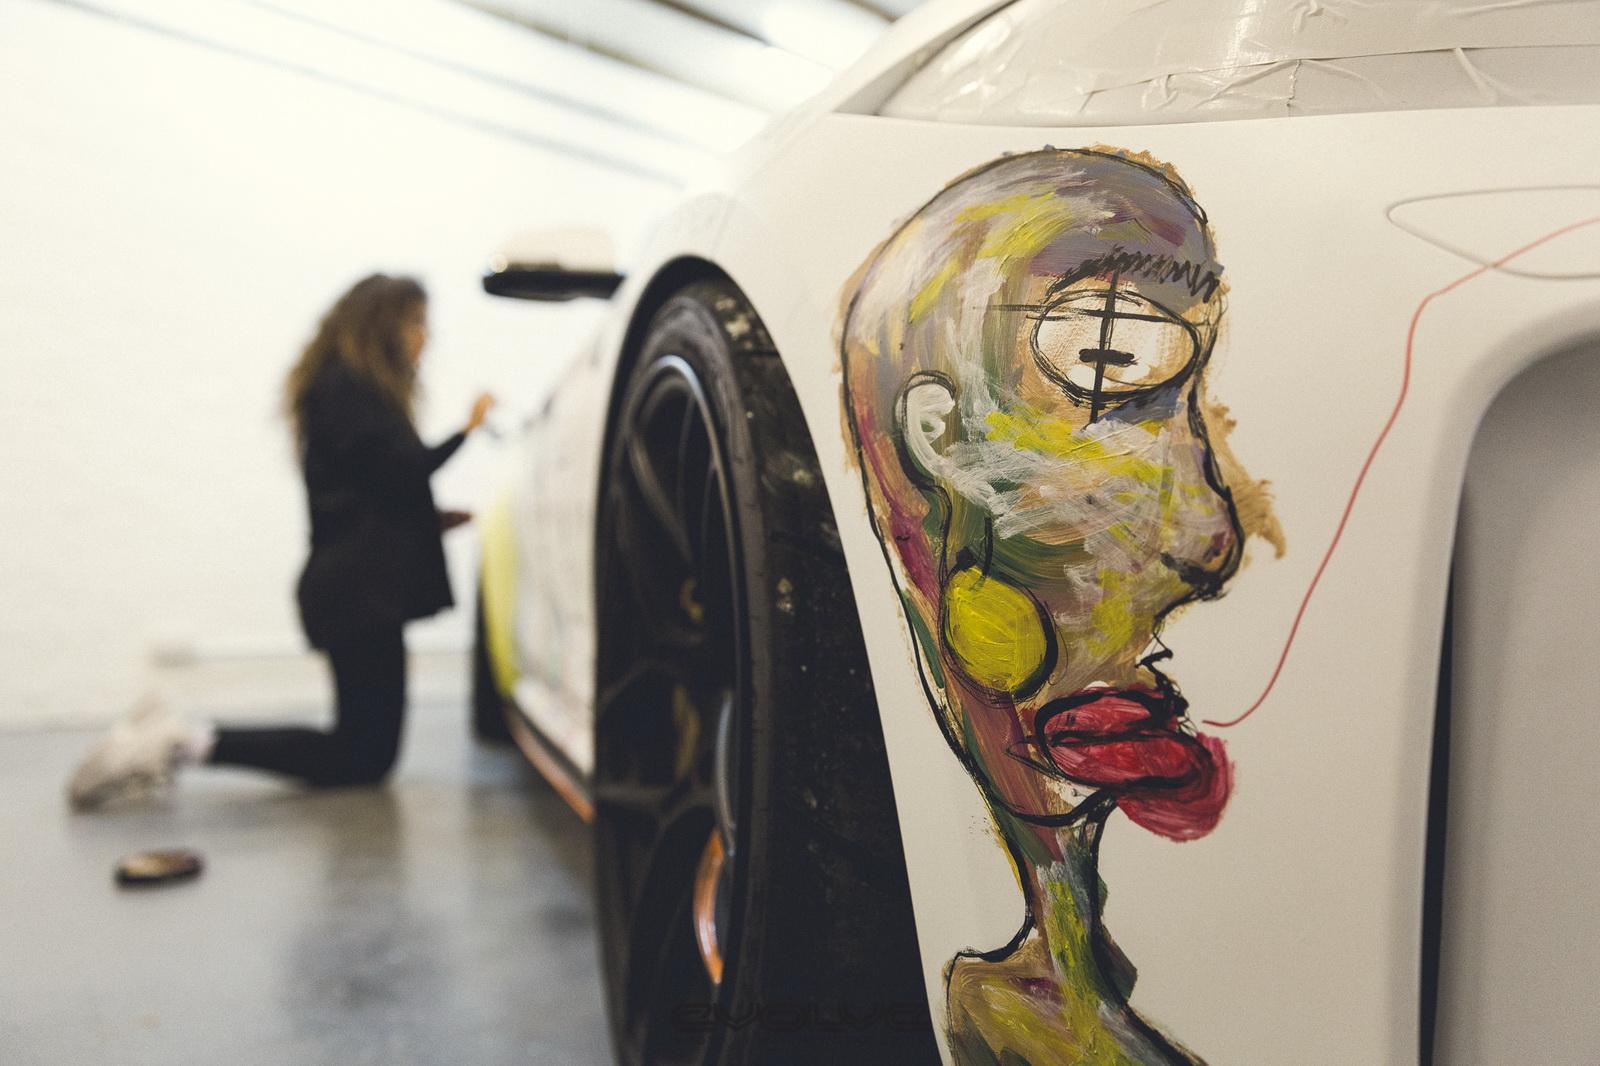 evolve-automotive-bmw-m2-gts-art-car-19